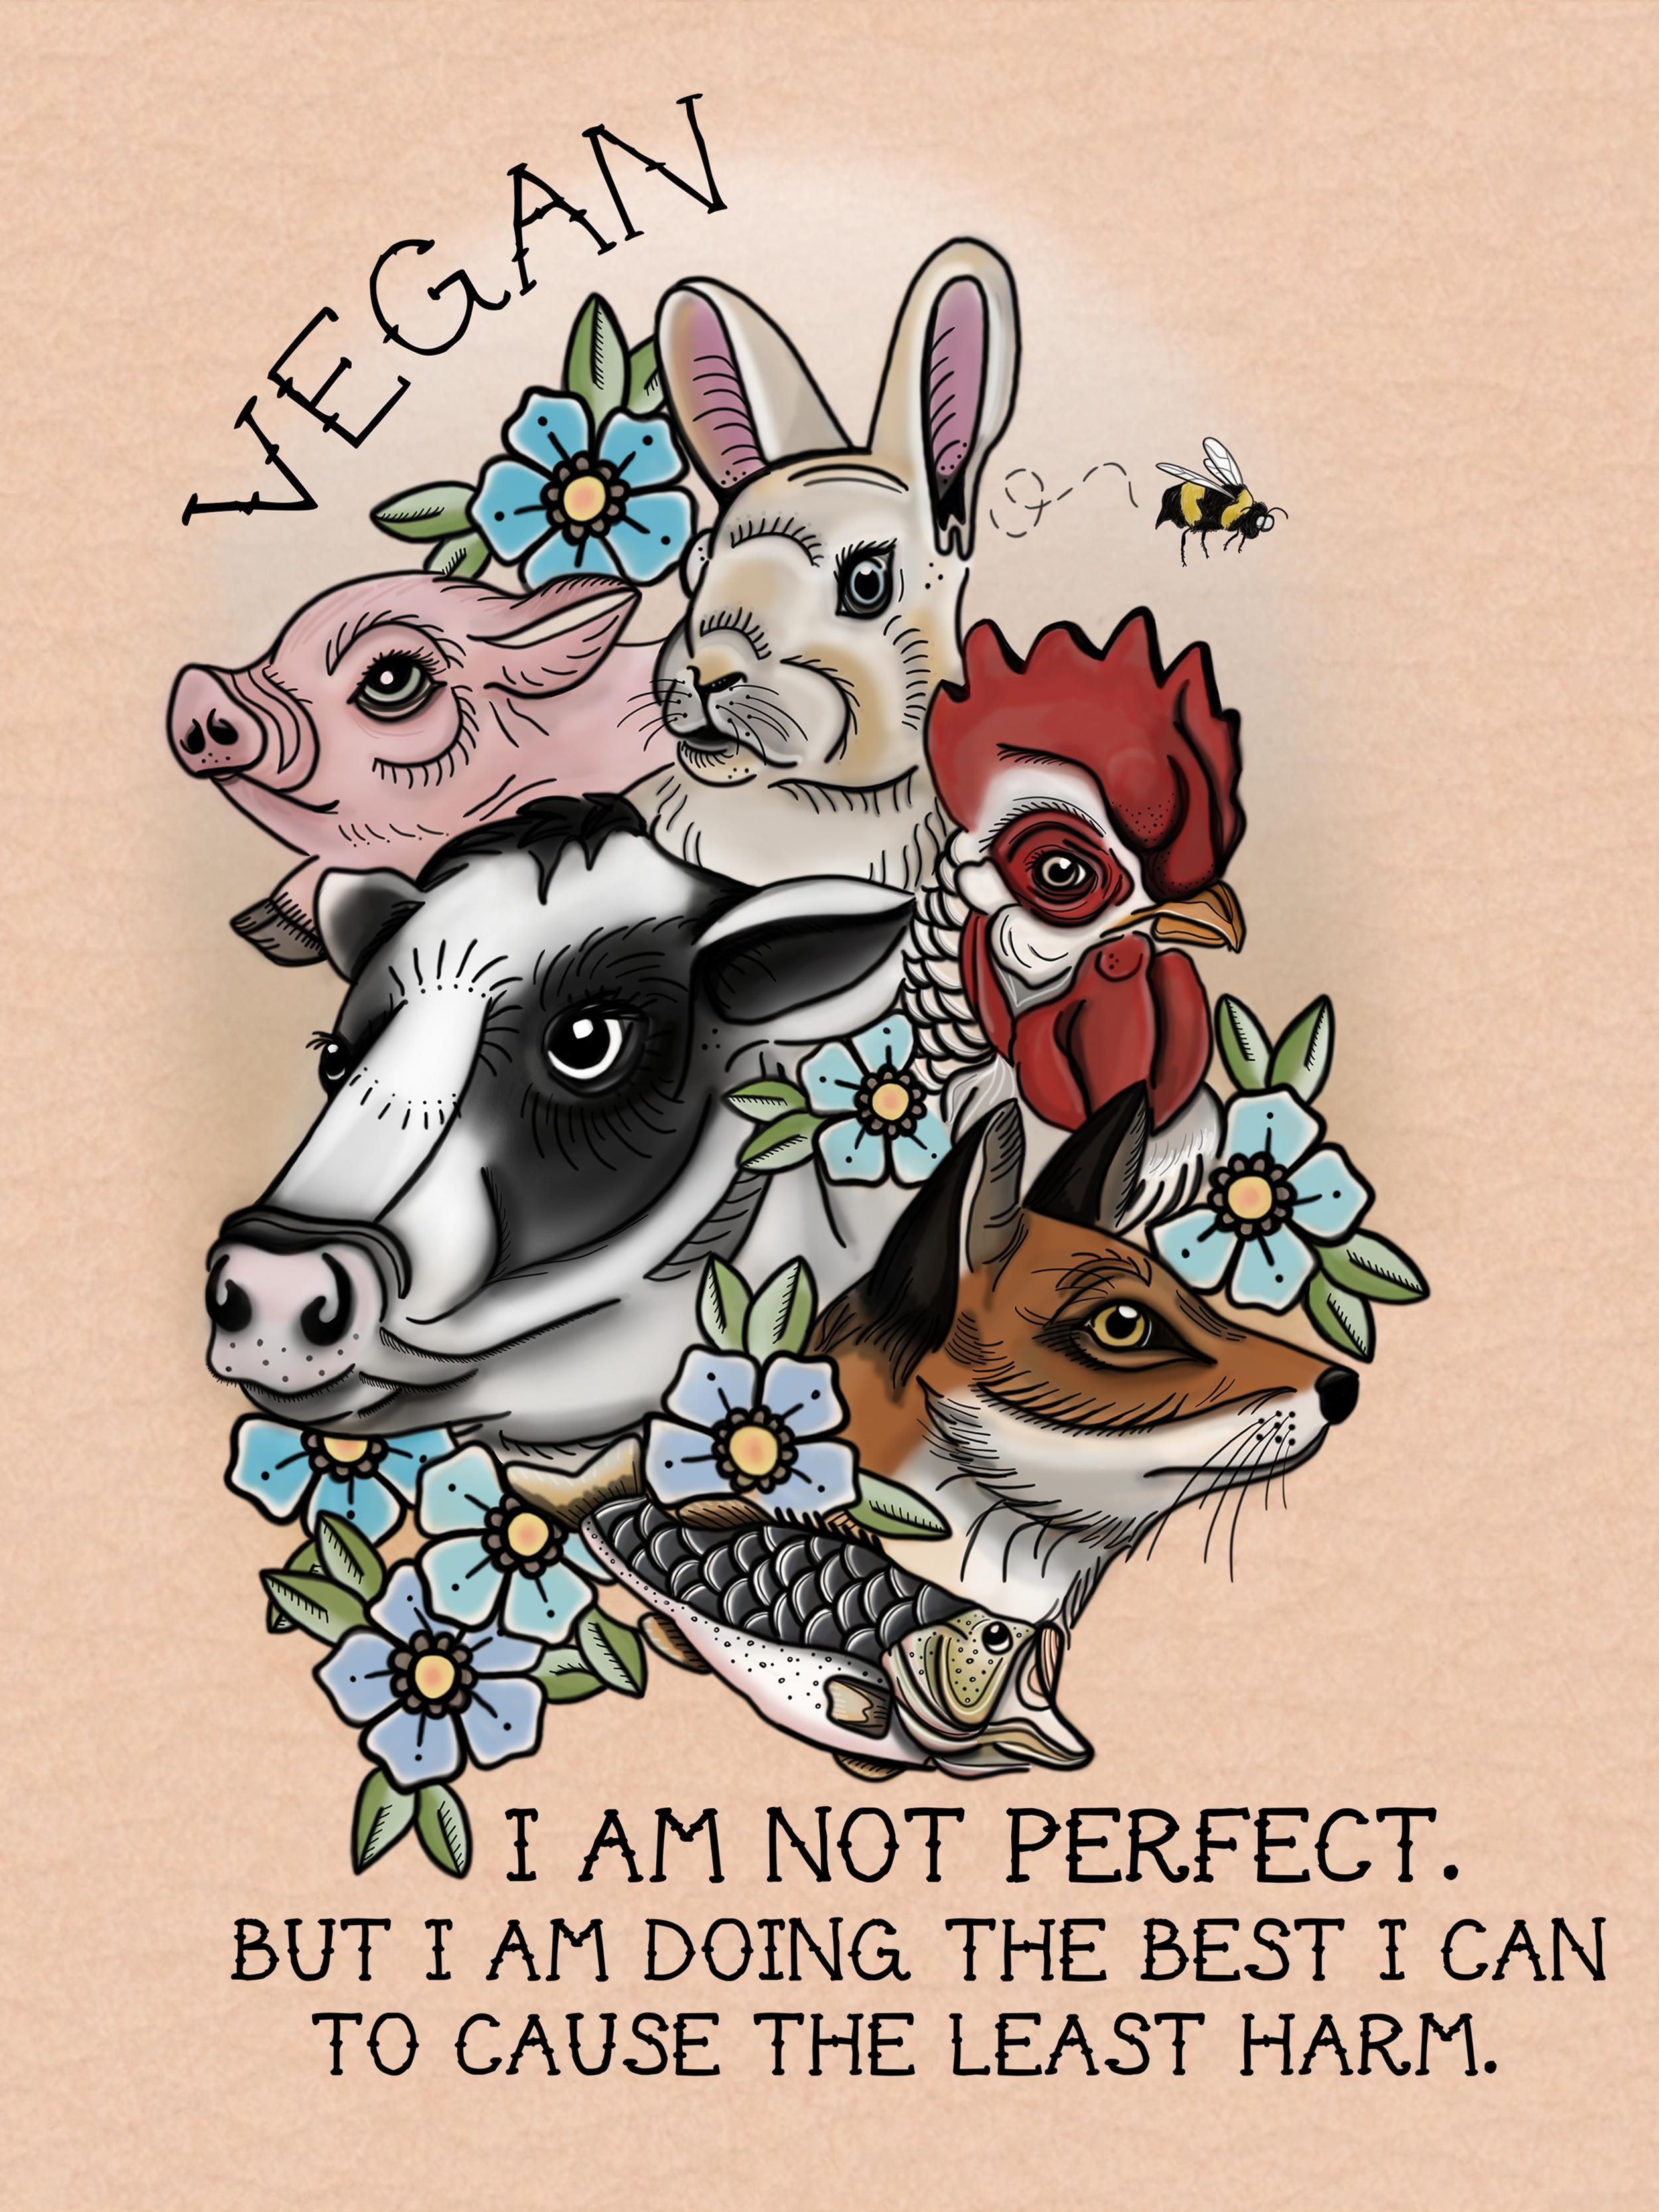 VeganNotPerfect9x12.png